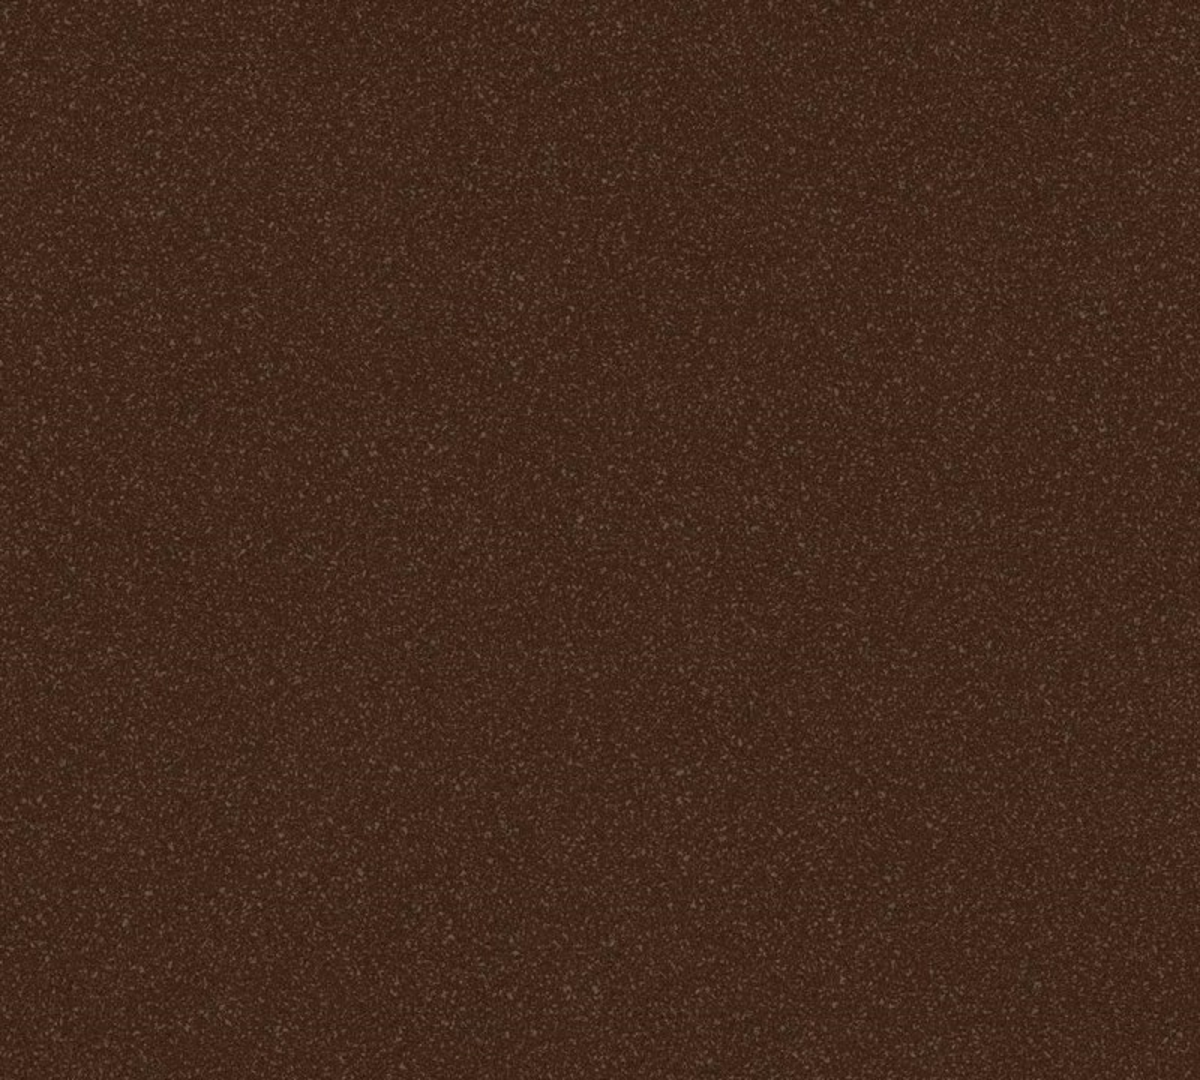 Линолеум Tarkett ACCZENT PRO Aspect 12 ACP2000704 (2 мм, 0,7 защита) шир. рул. 3м, КМ2